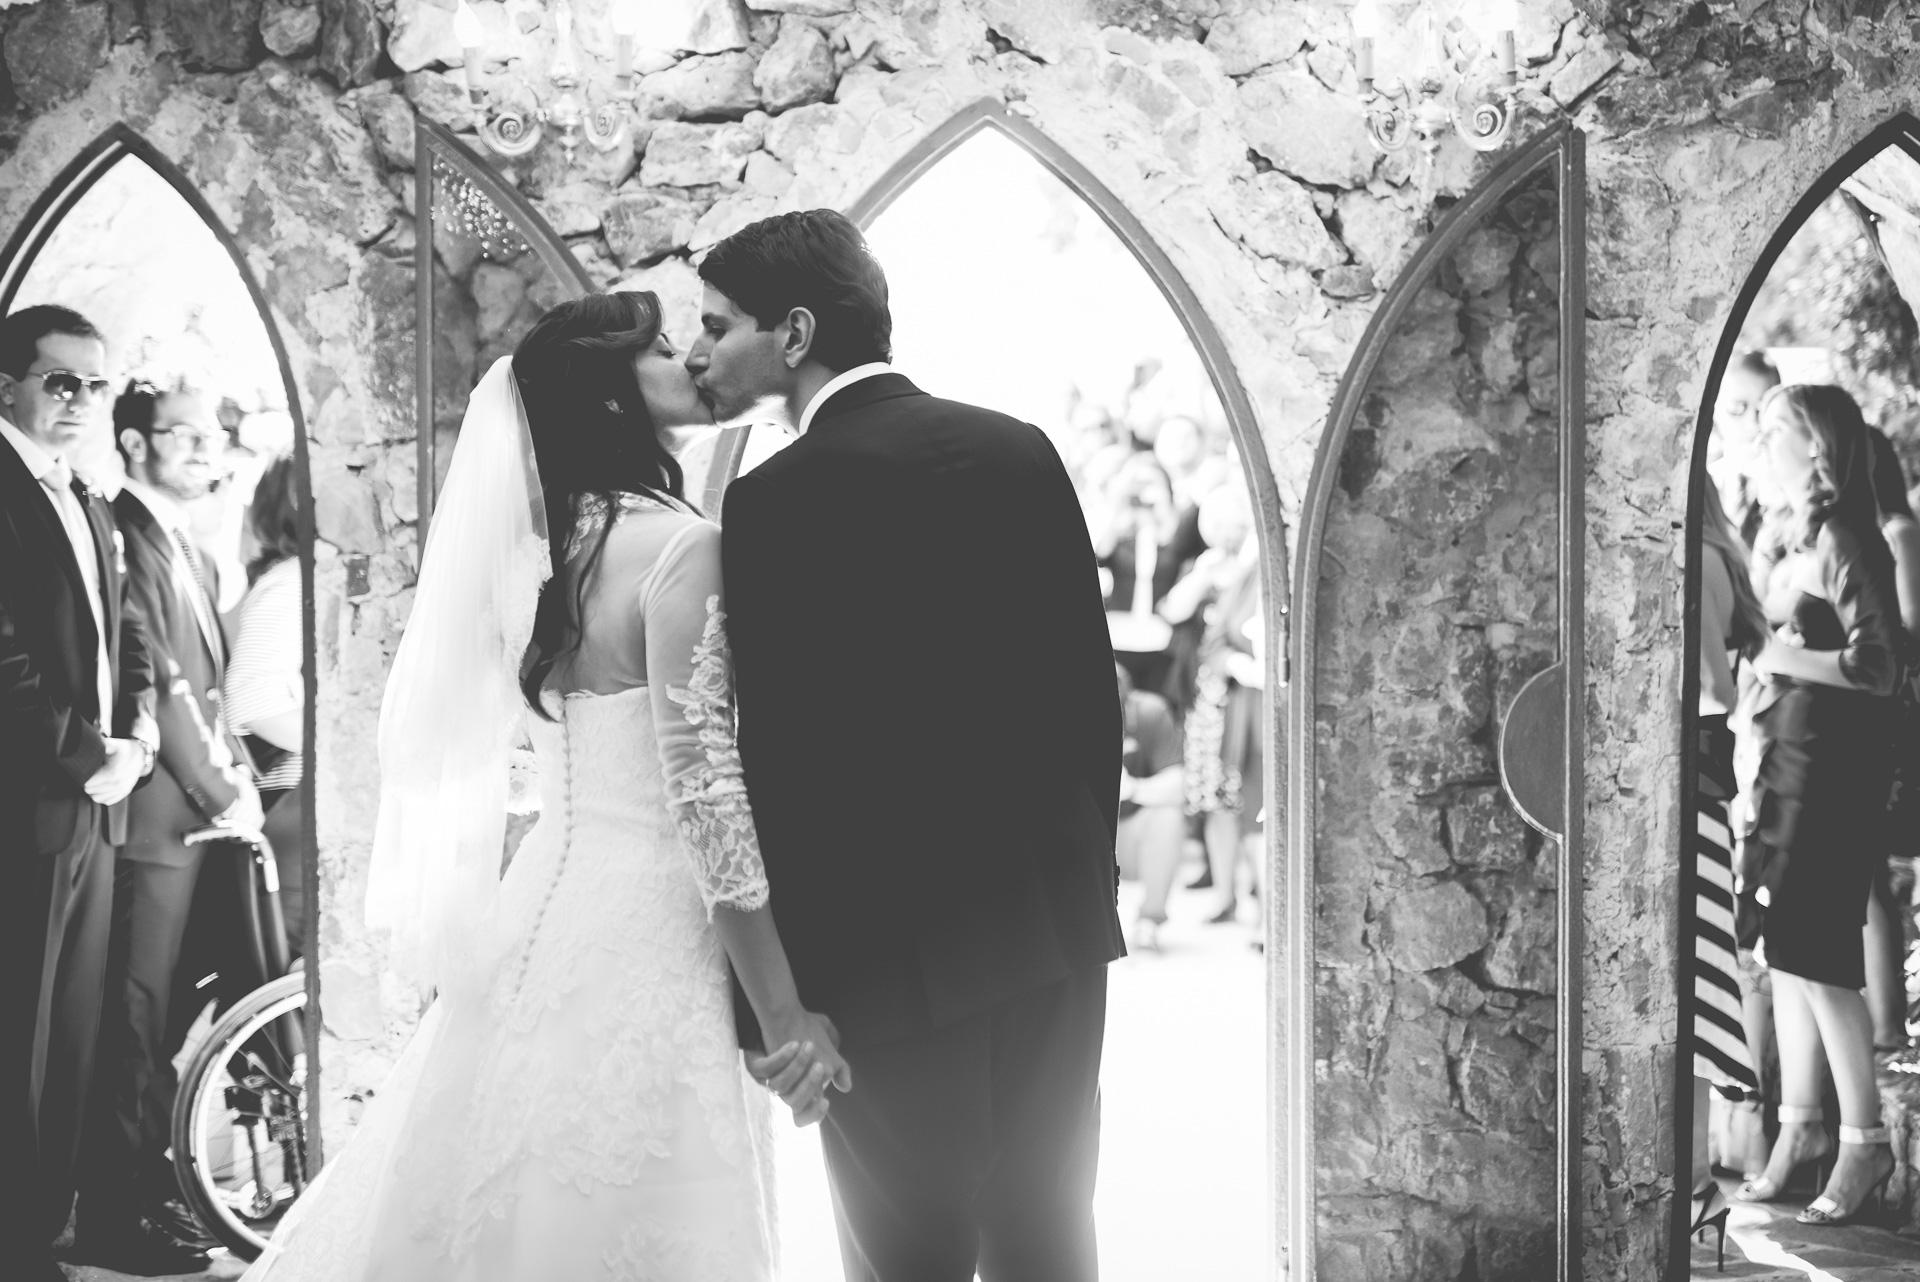 Wedding Photo - Il Saraceno, Amalfi   MamaPhoto